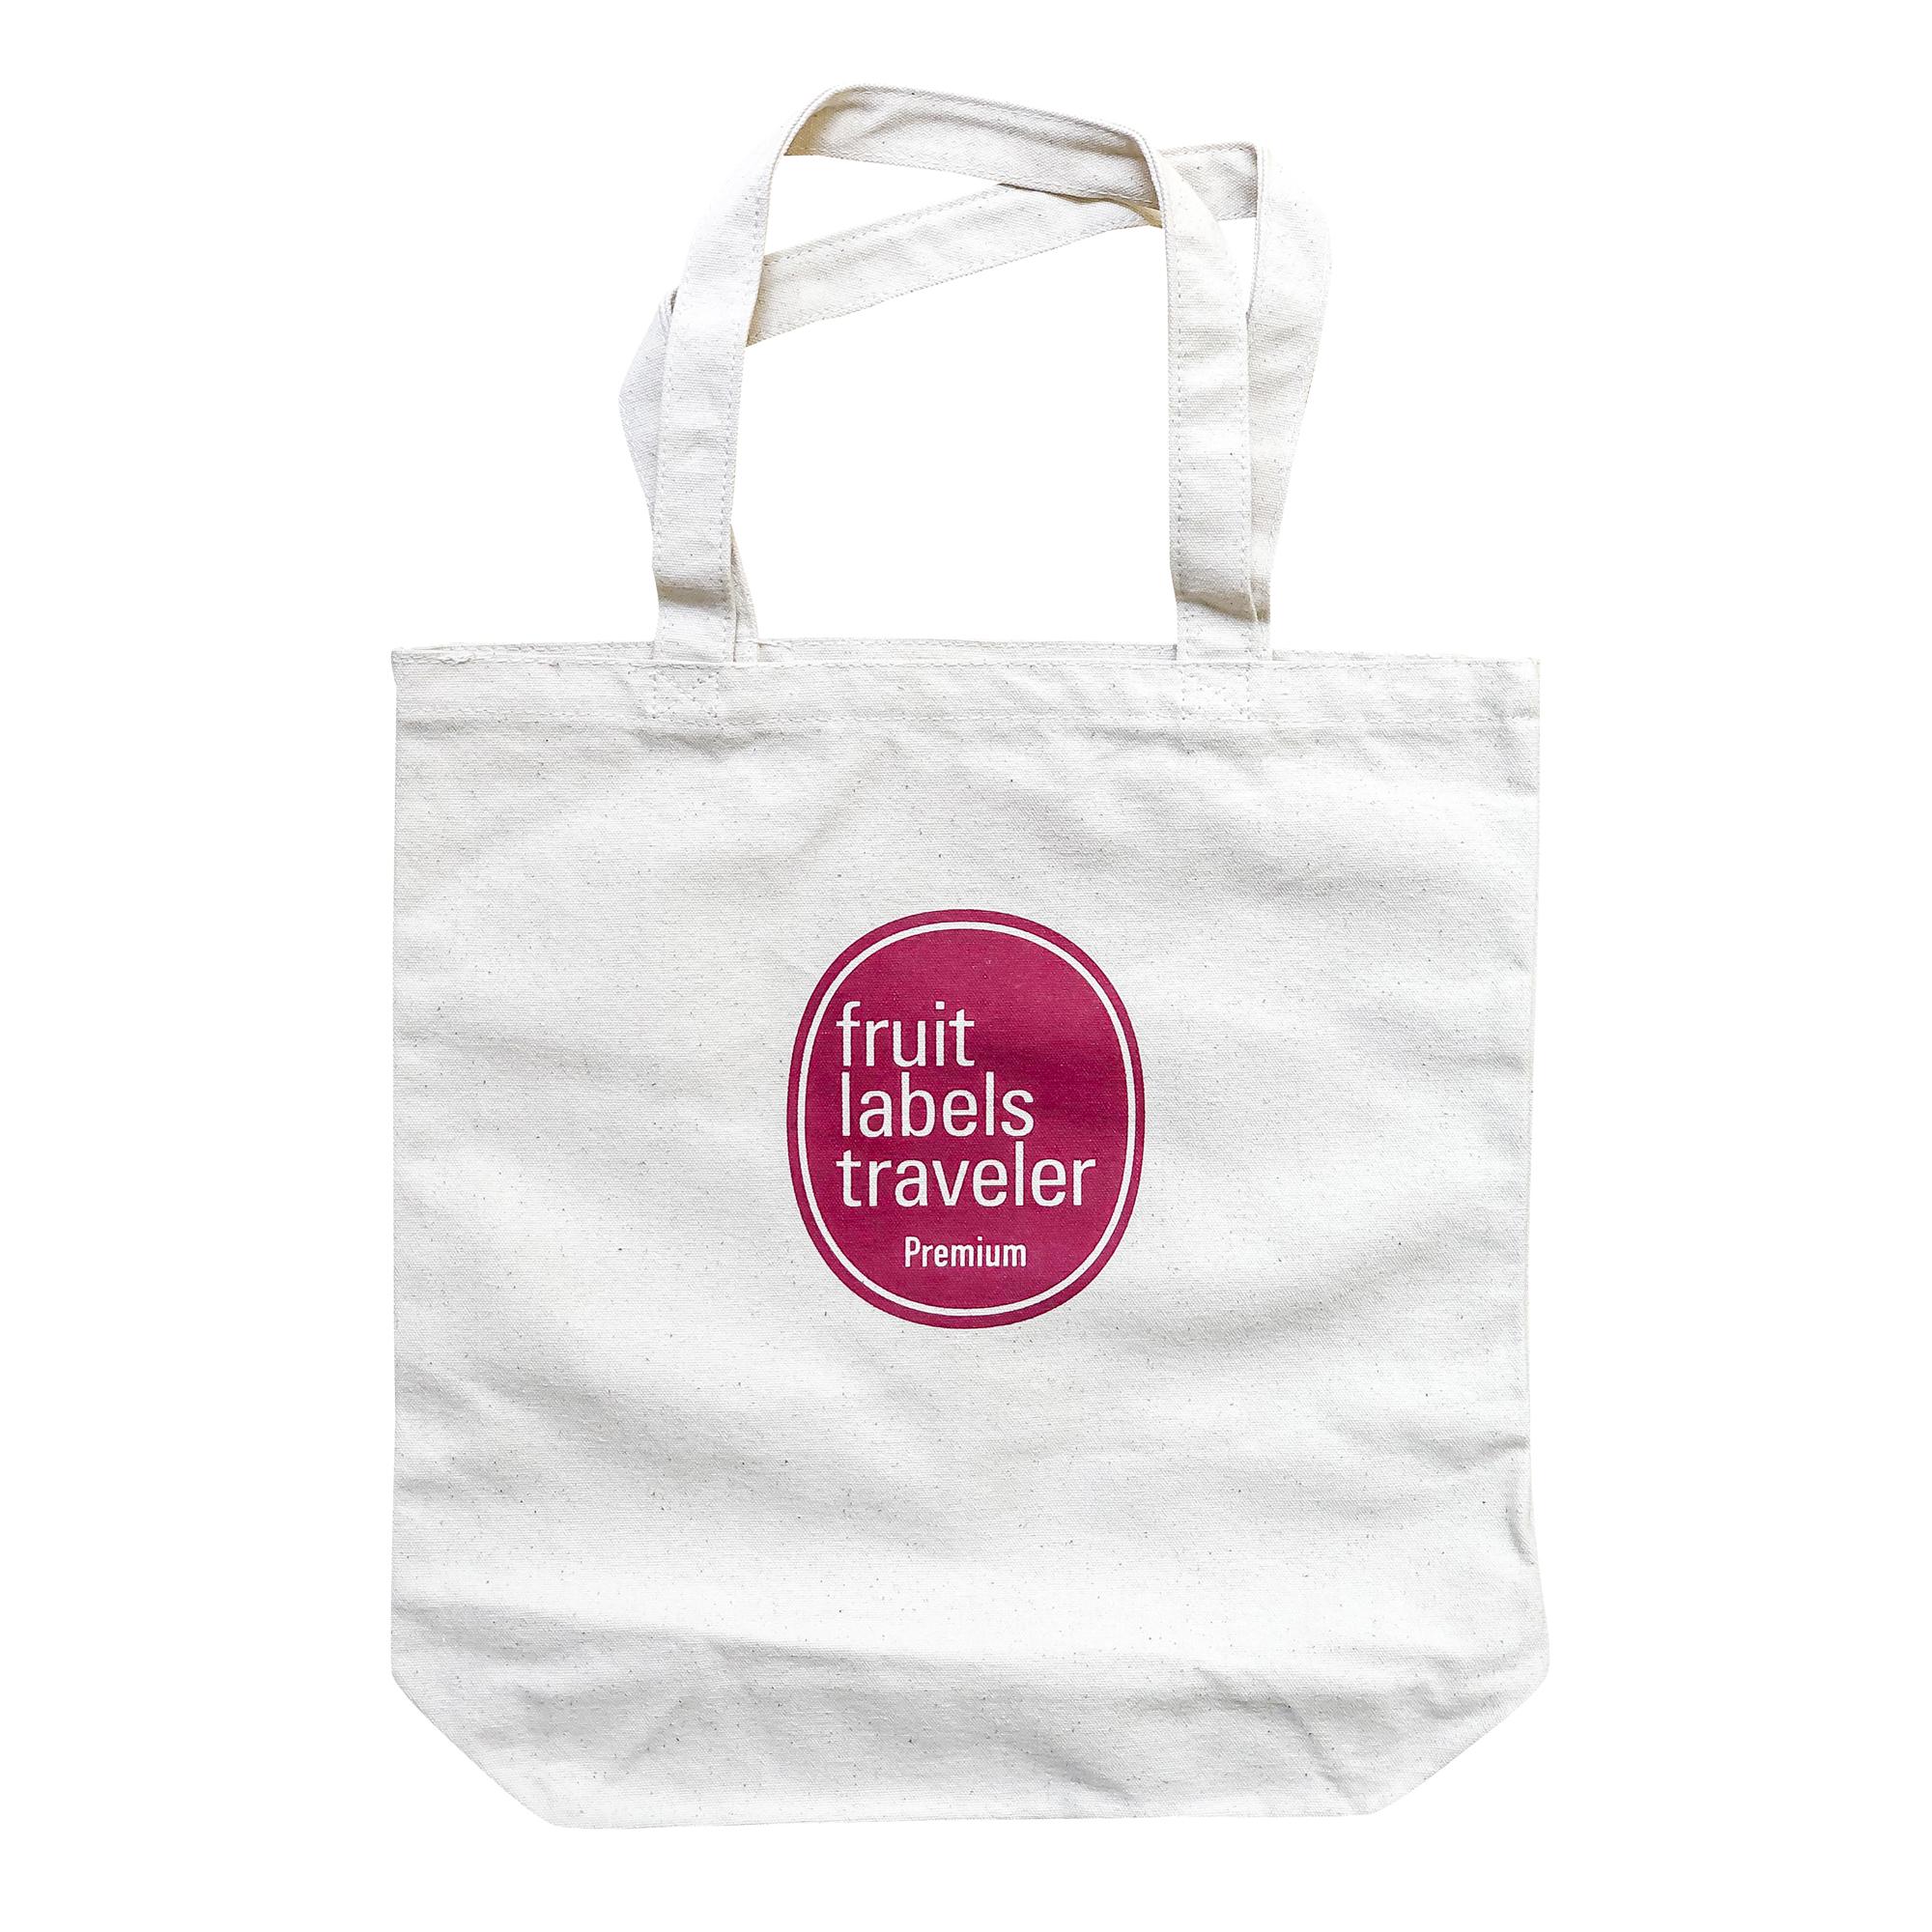 Fruit Labels Traveler 旅するフルーツシール展|キャンバス・トートバッグ 赤版